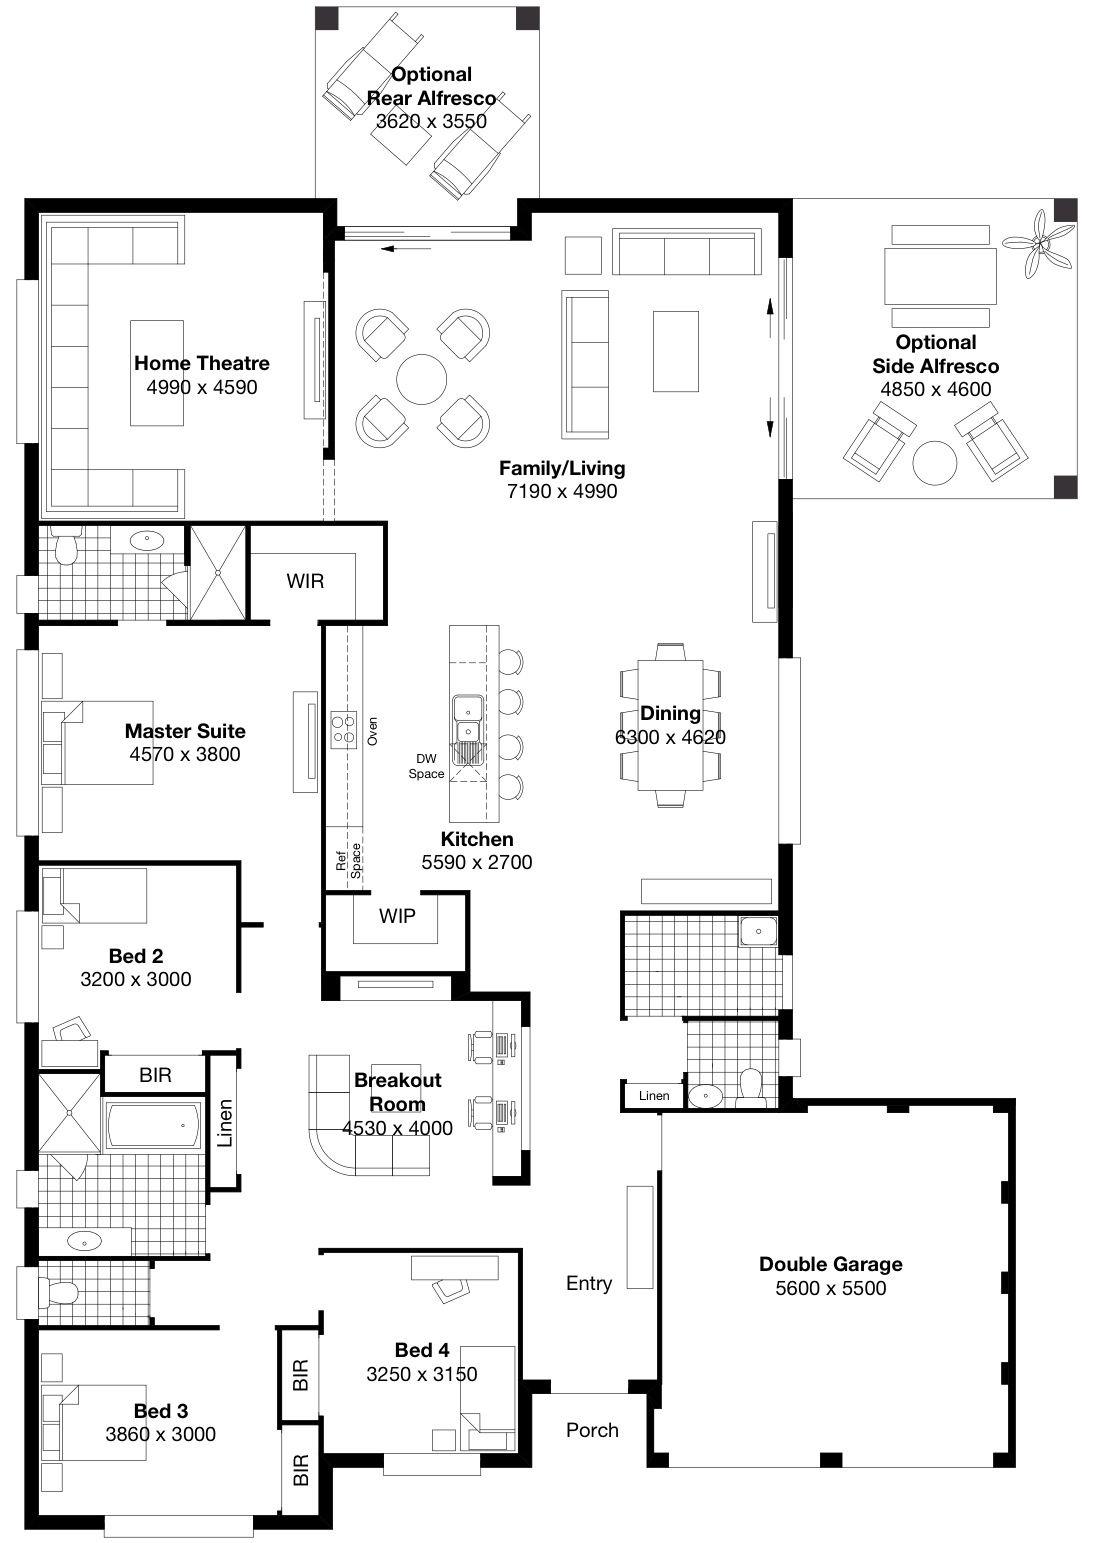 Serta Meredith Convertible Sofa Reviews Large Back Pillows Masterton Homes Plans Awesome Home